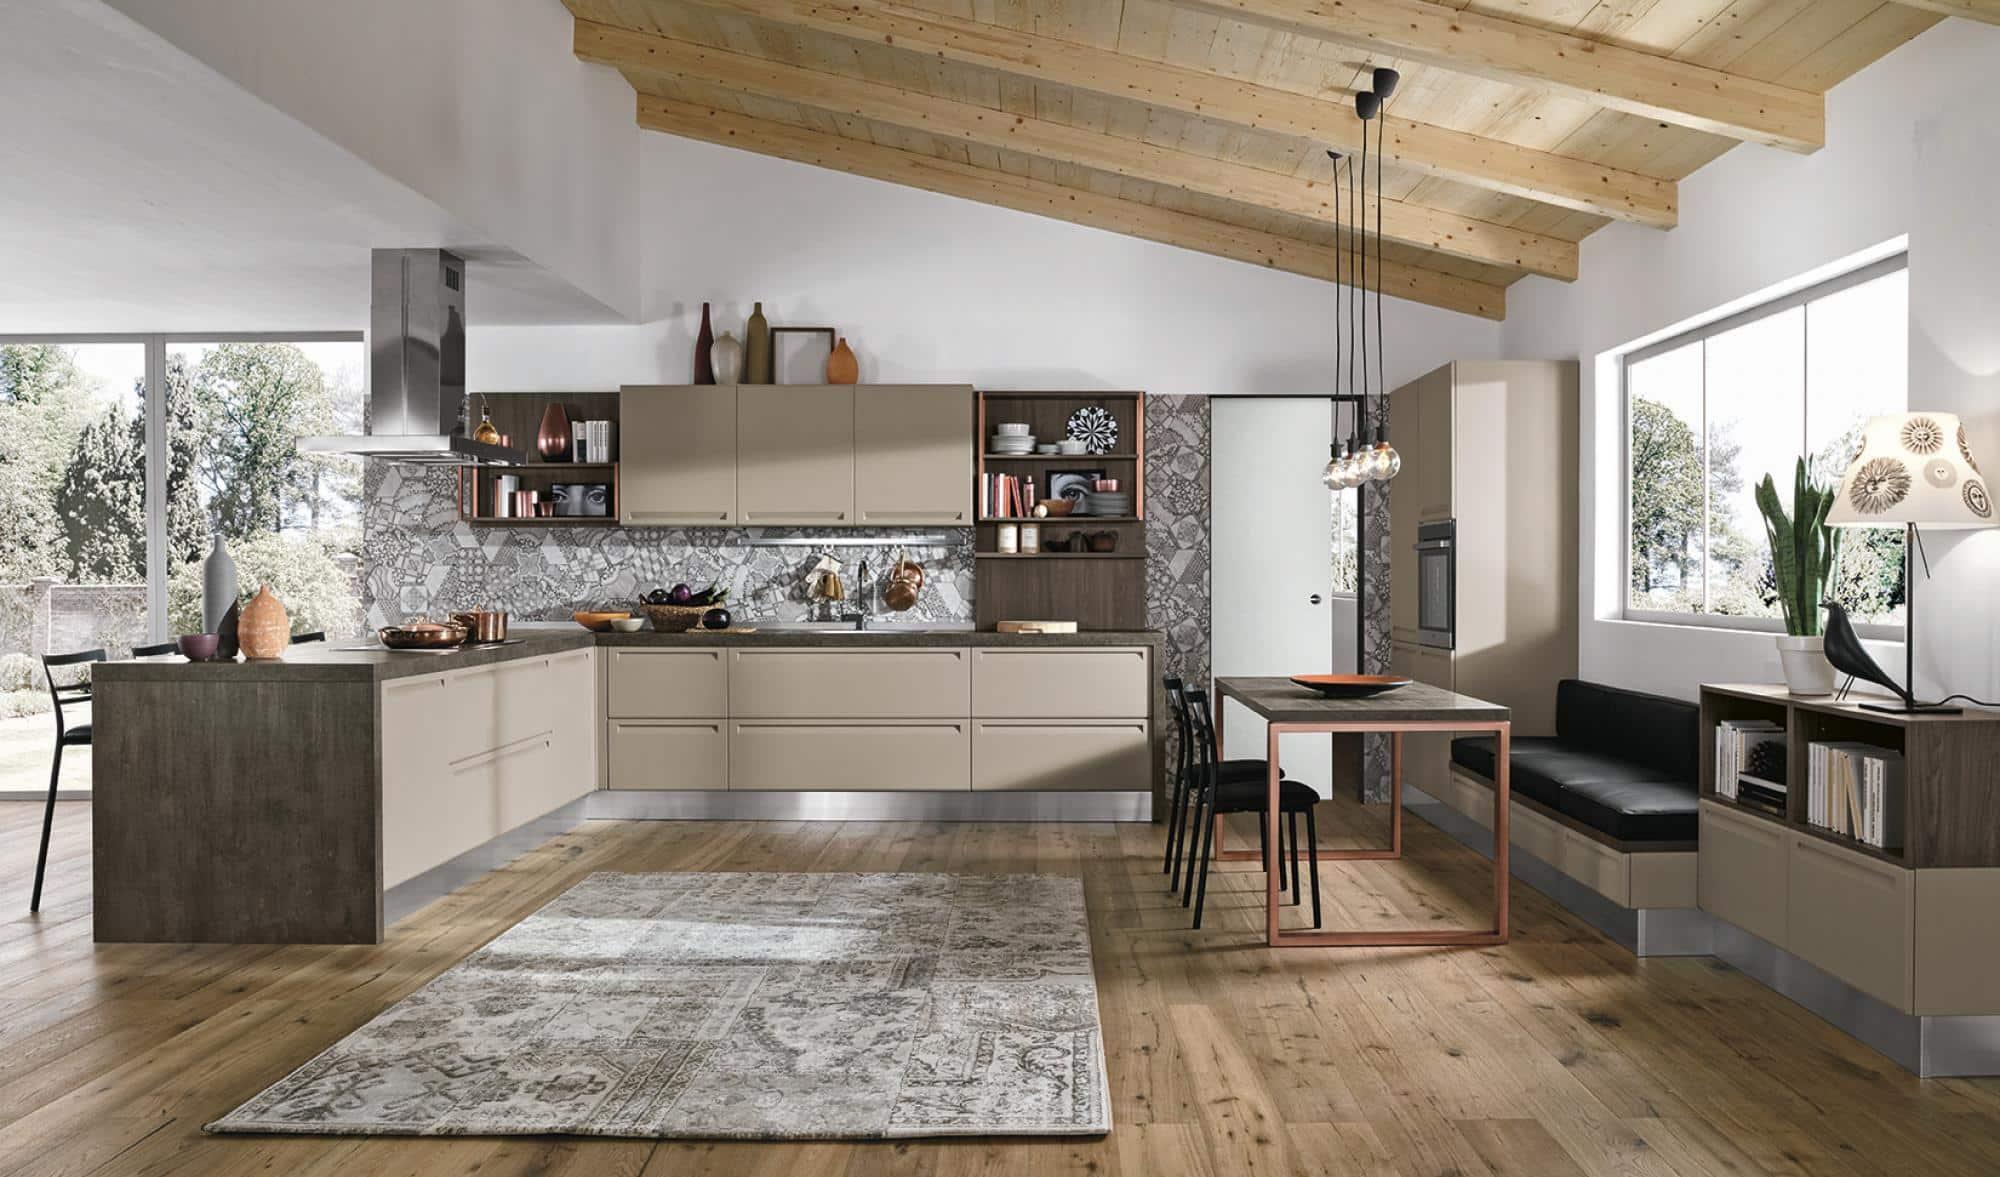 Isla κουζινα γκρι-μπεζ χρωματισμο πολυμερικο με ενσωματωμενη λαβη και ρετρο υφος